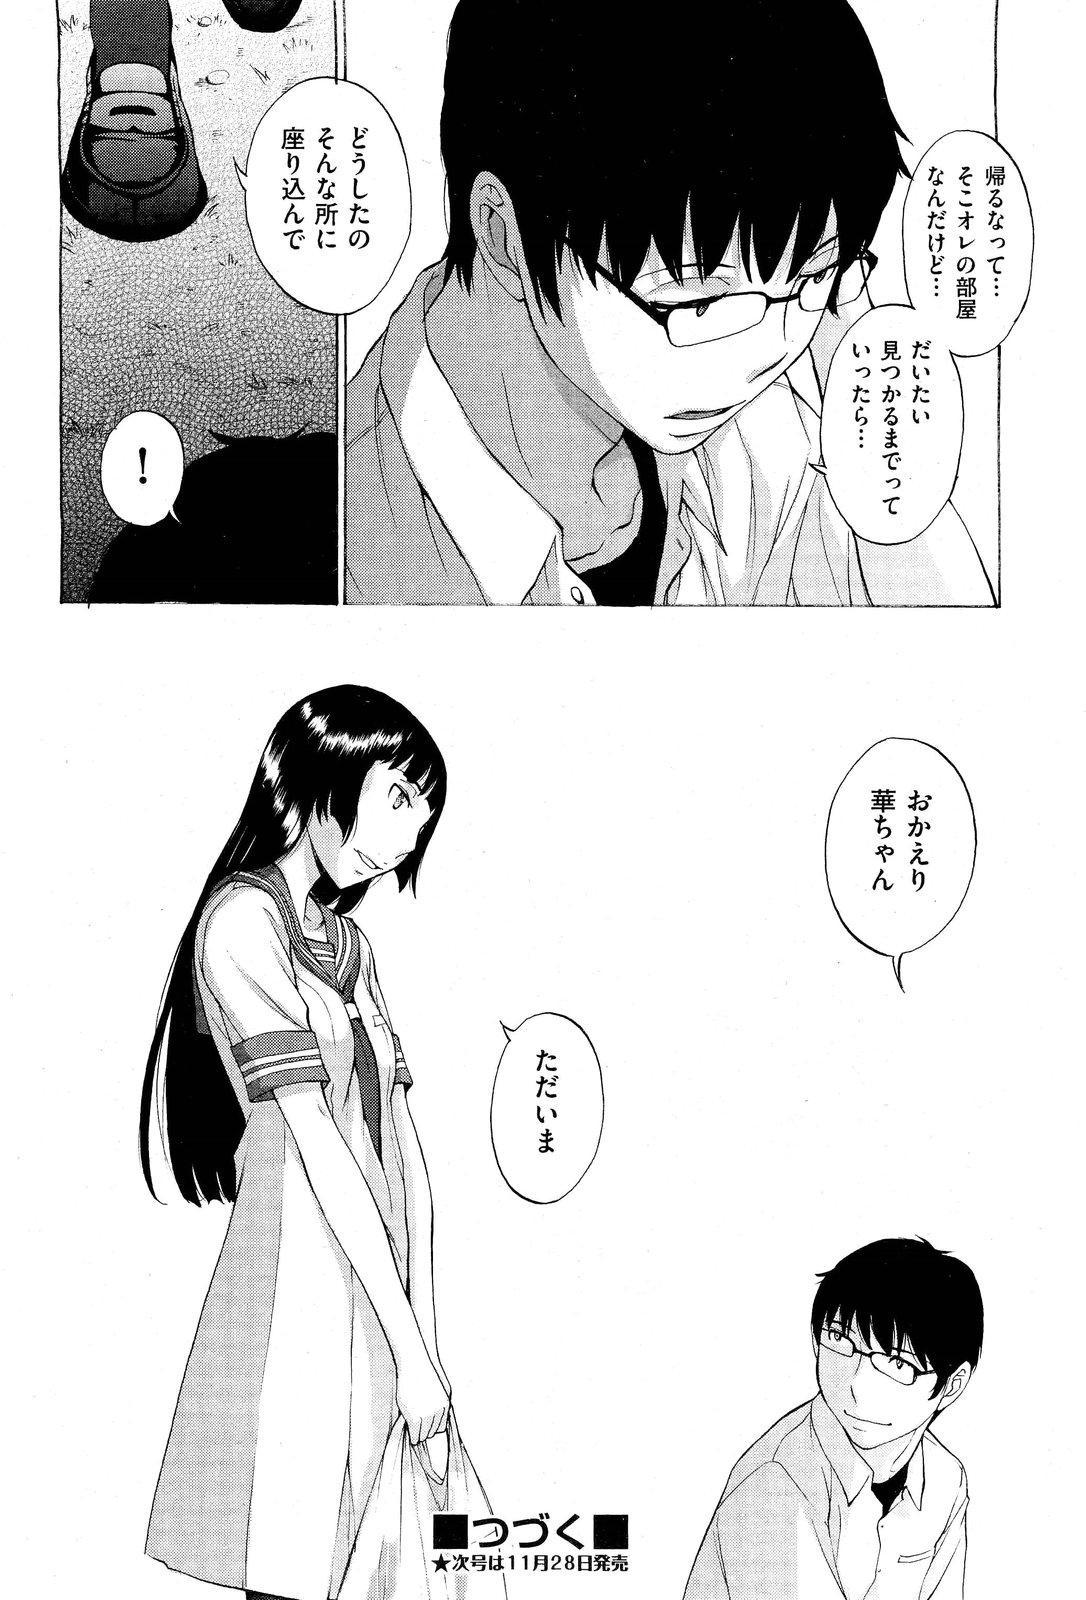 Hanazono 174